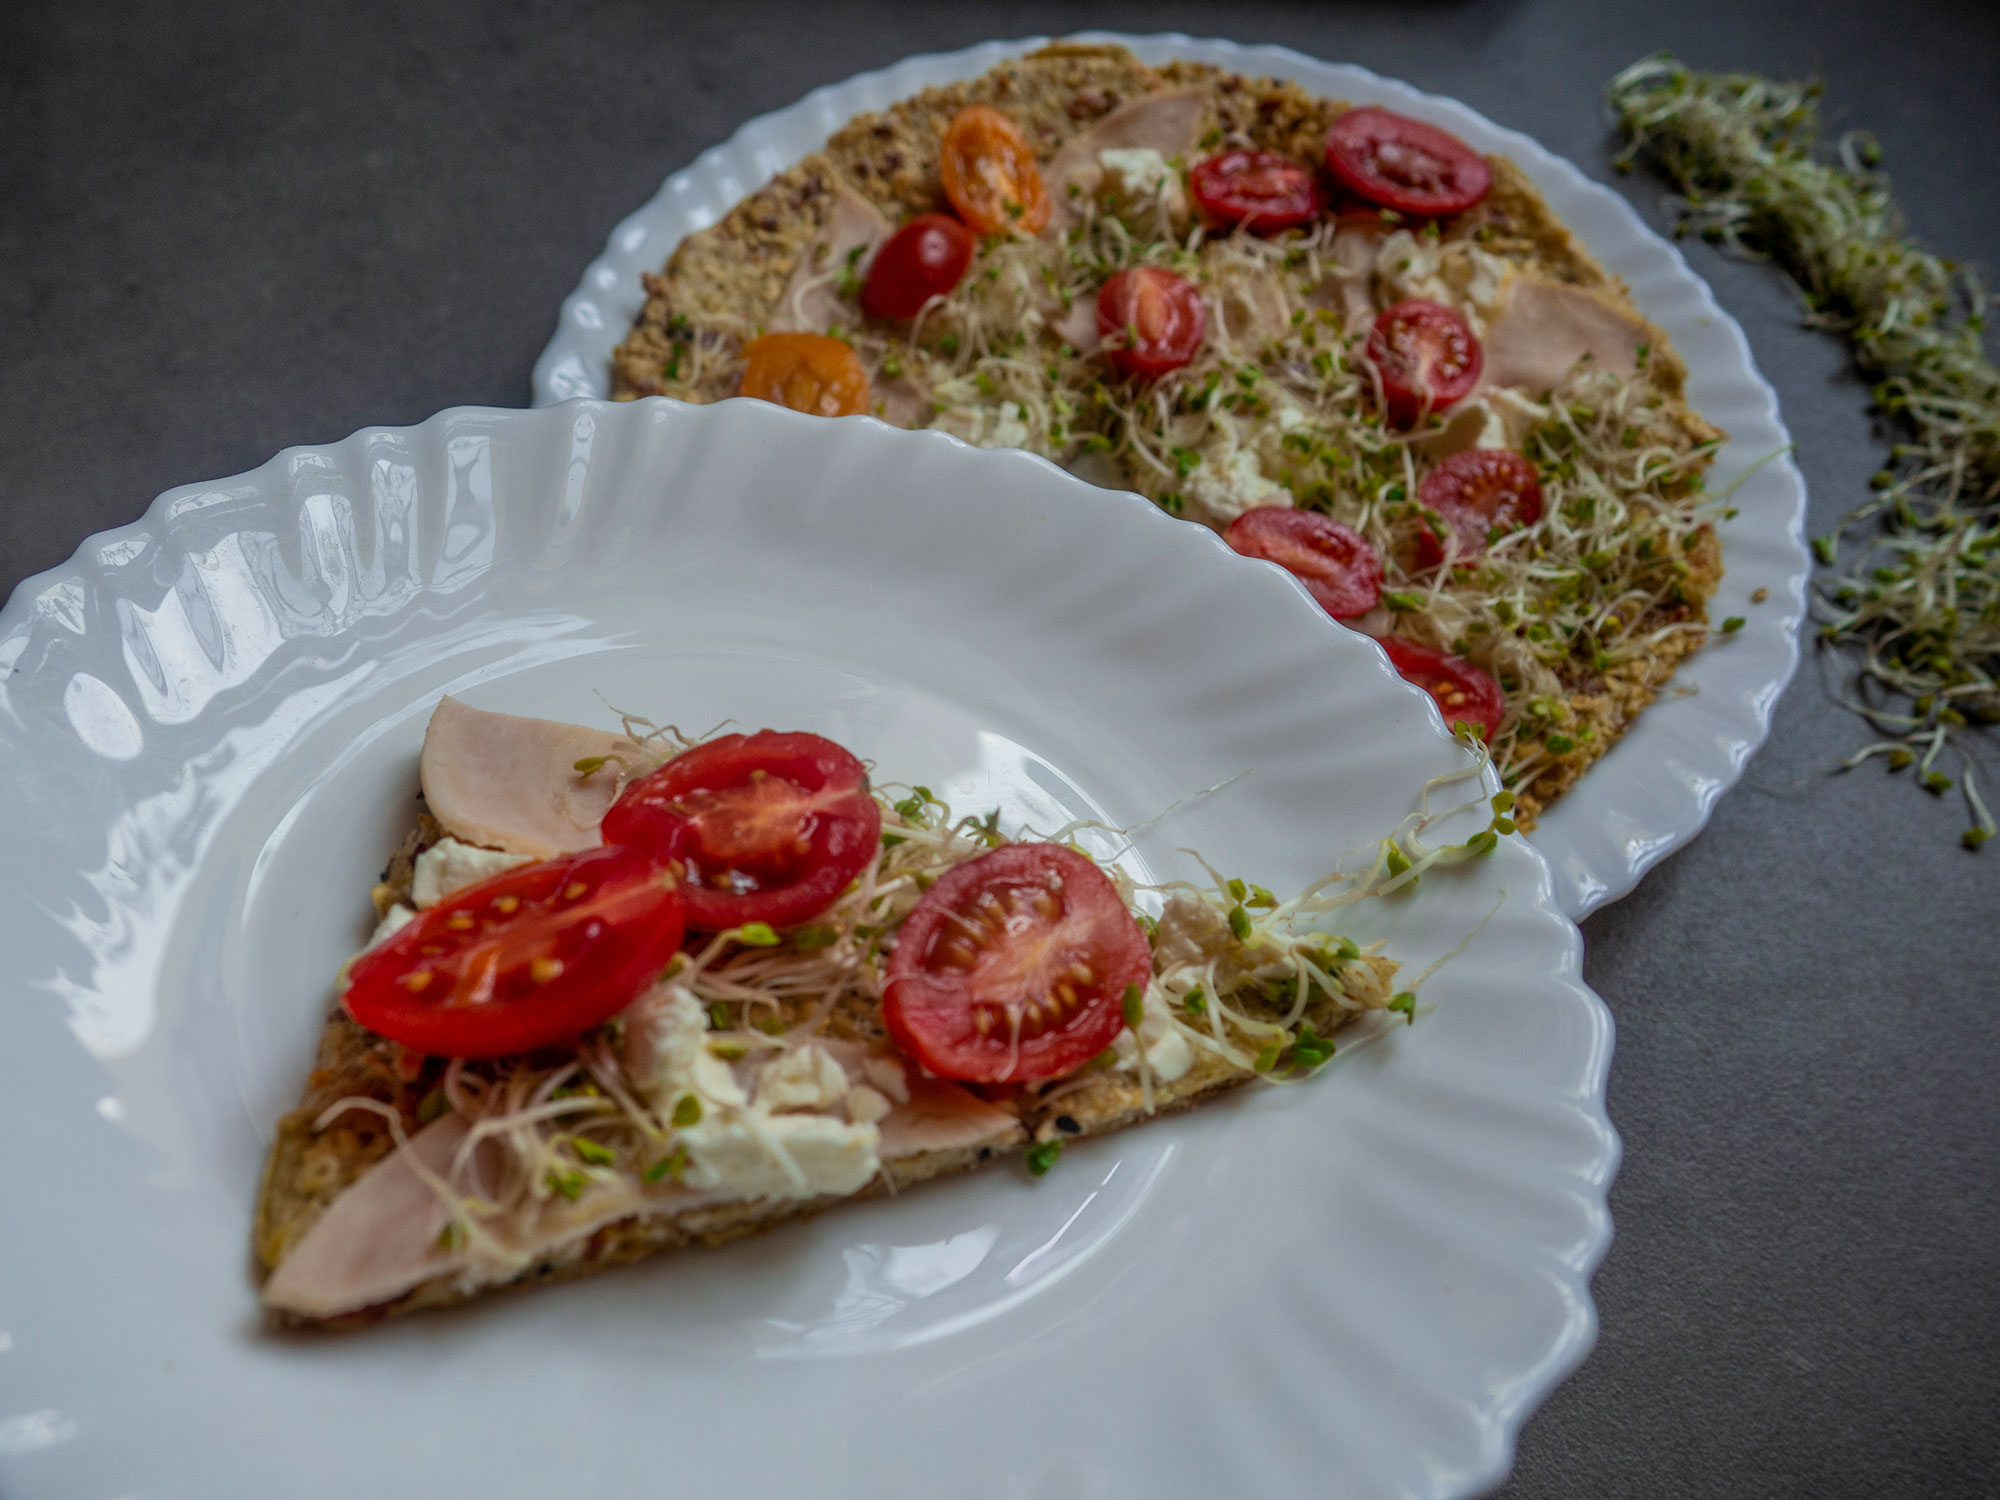 Oat Pizza piece